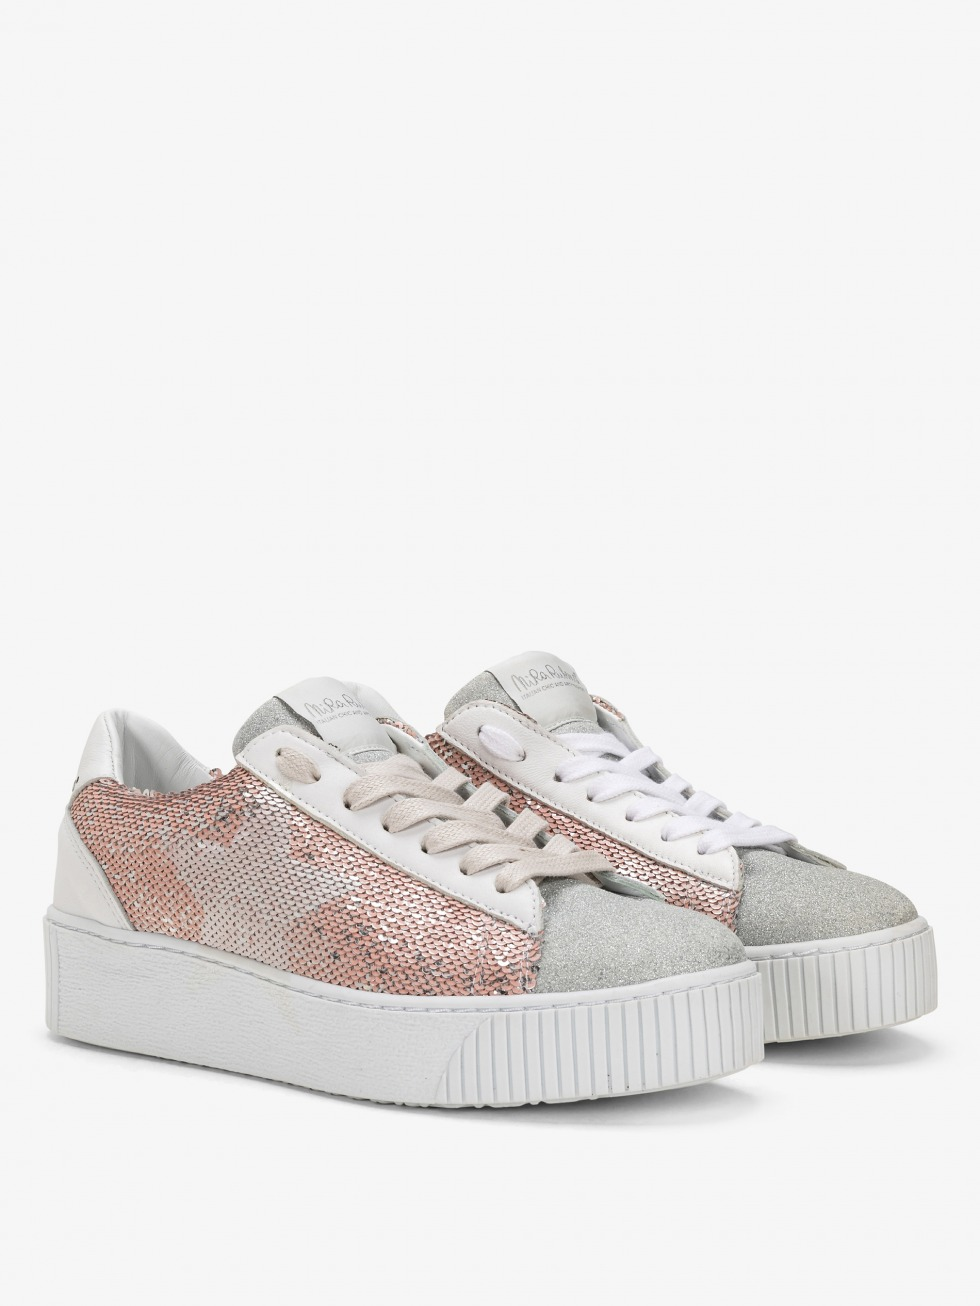 Cosmopolitan Sneakers - Sparkle Pink Star